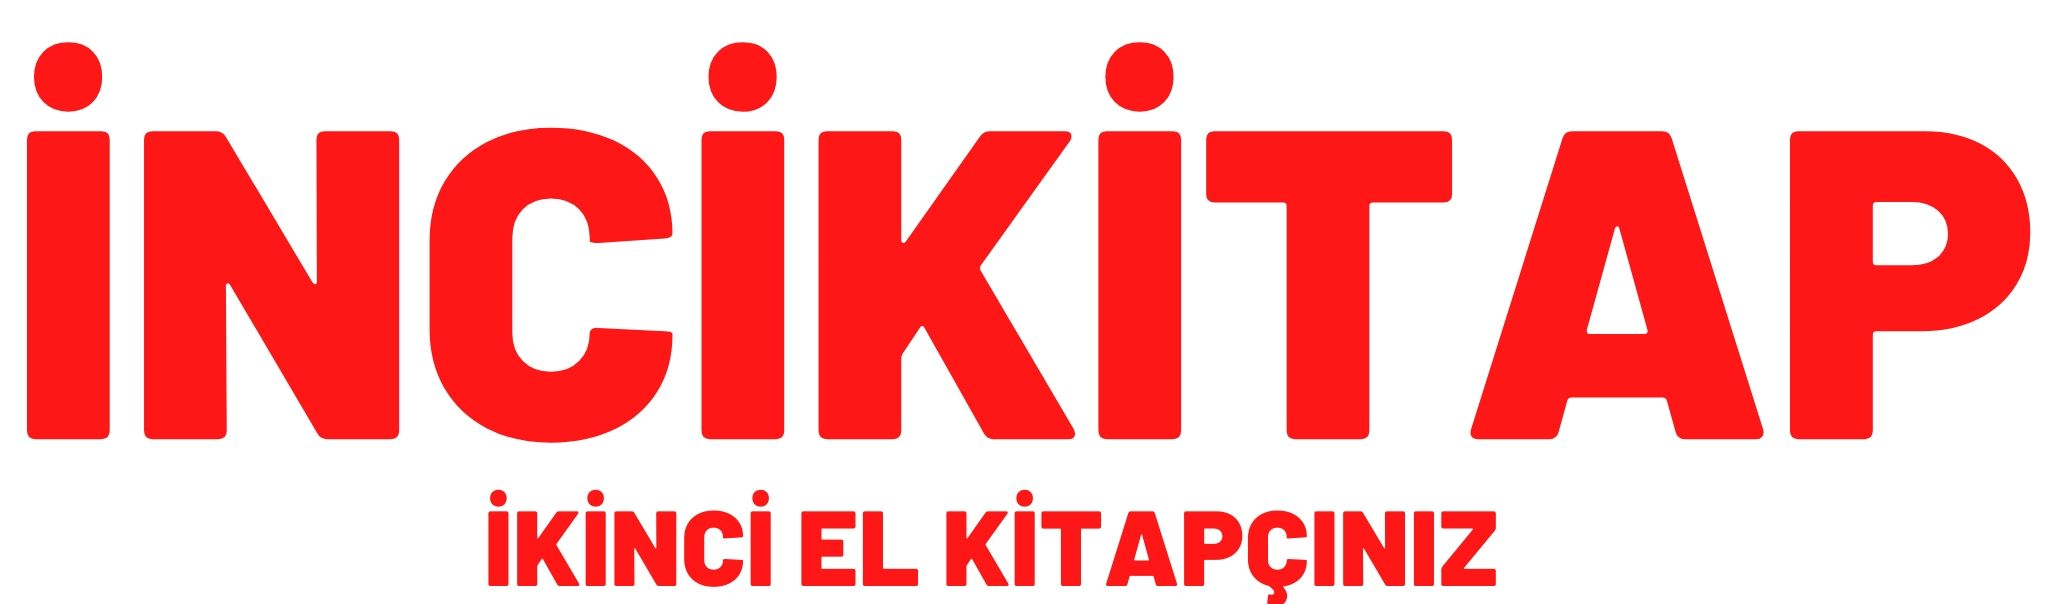 incikitap com